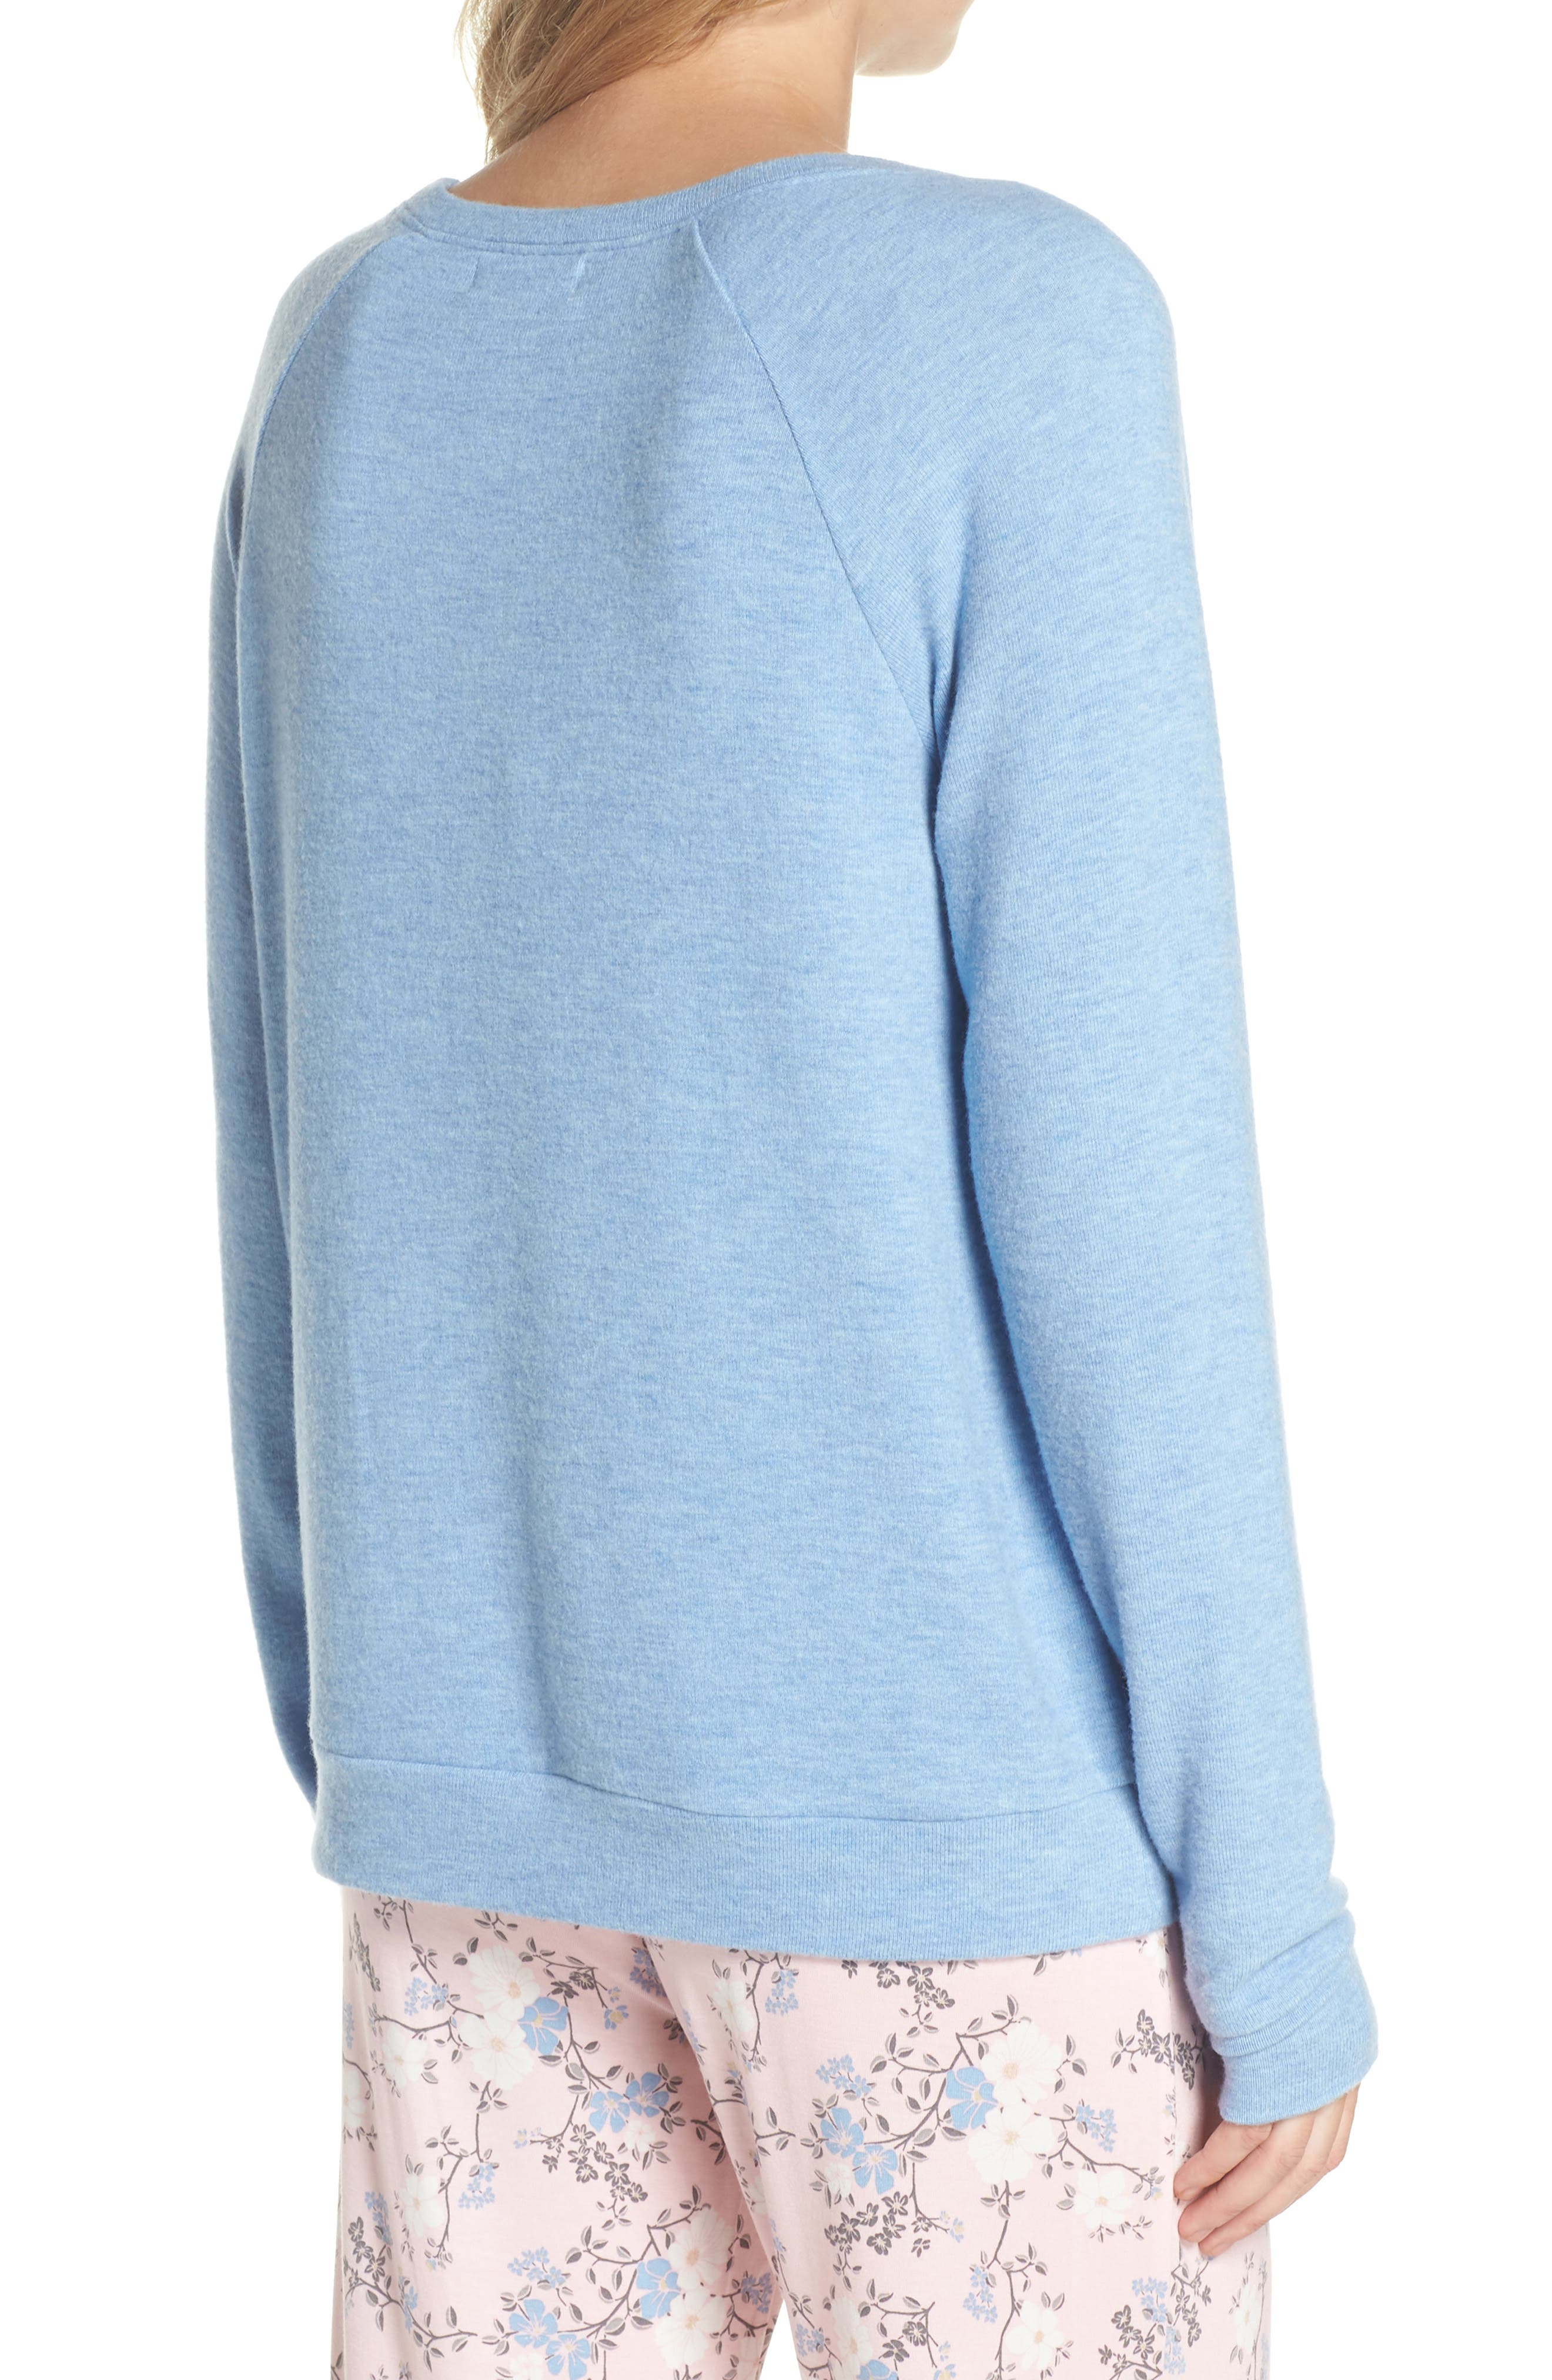 Peachy Pajama Shirt,                             Alternate thumbnail 2, color,                             Blue